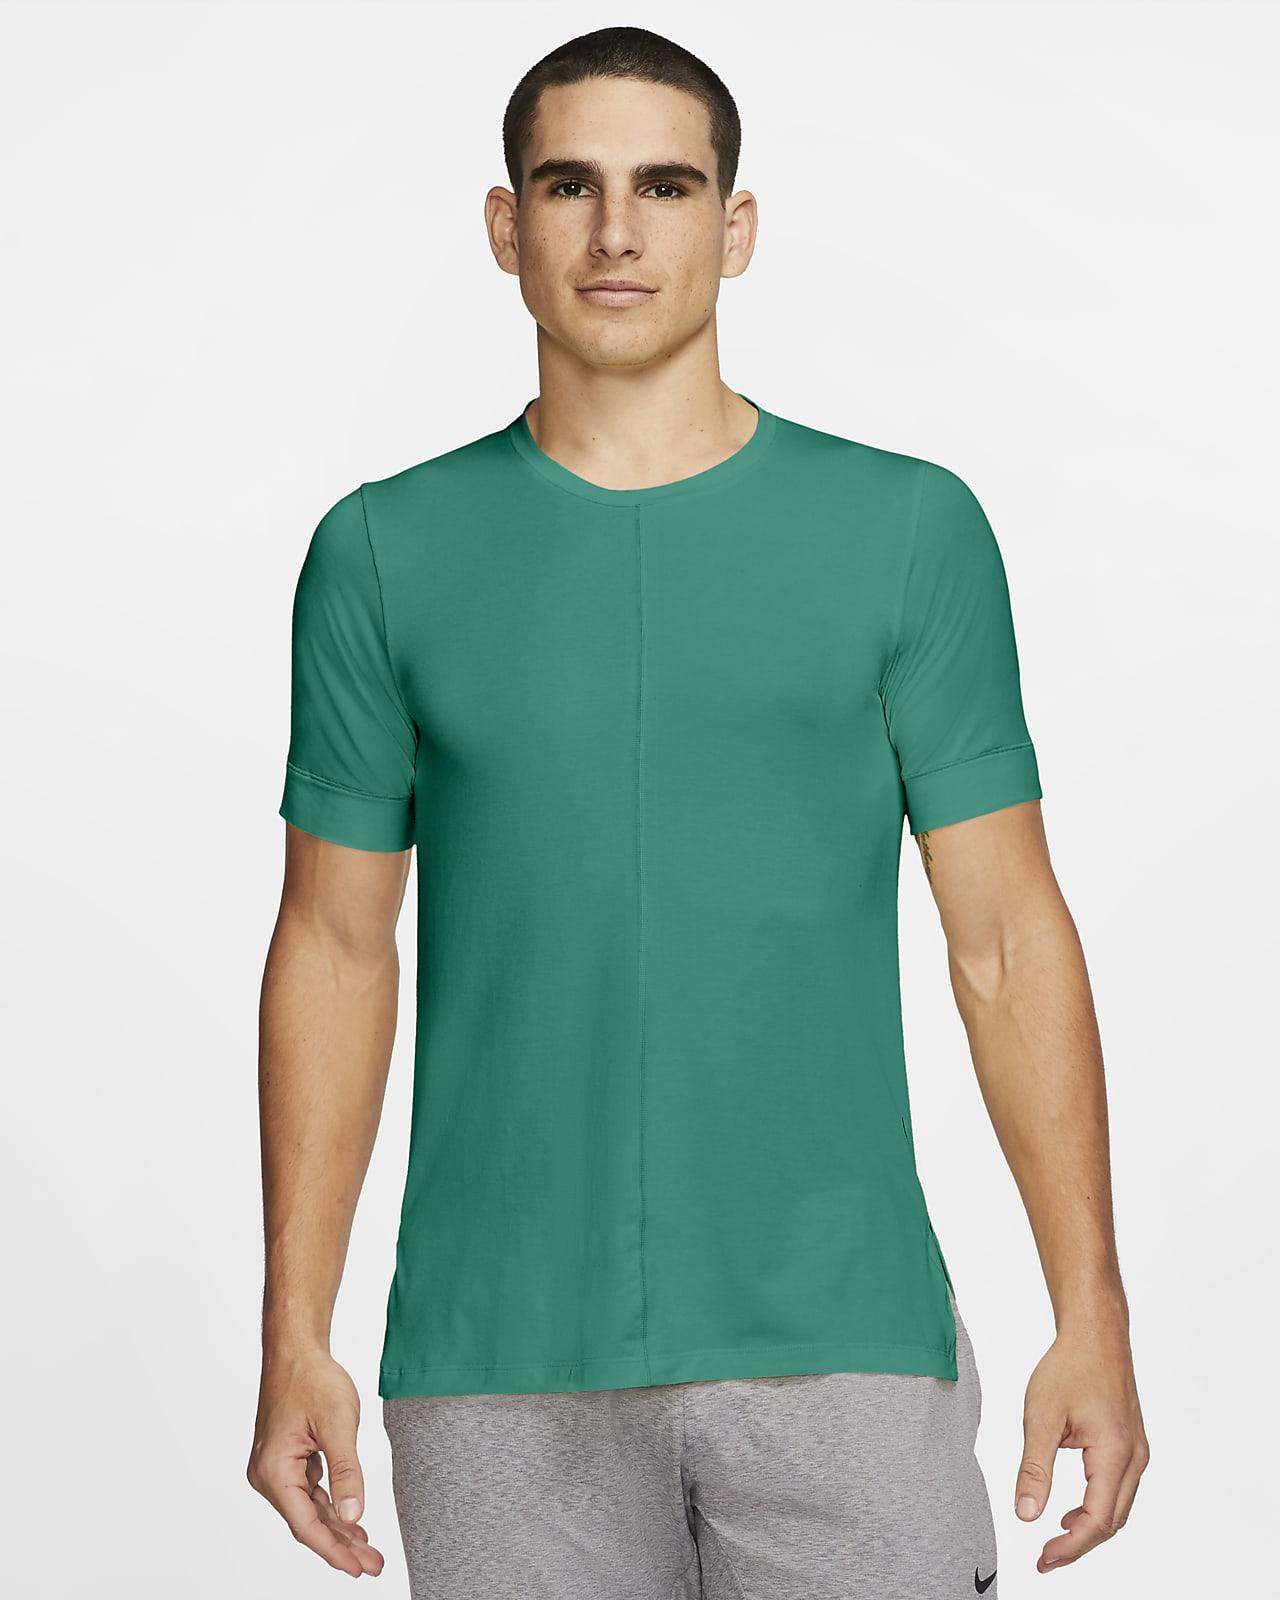 Мужская футболка с коротким рукавом Nike Yoga Dri-FIT